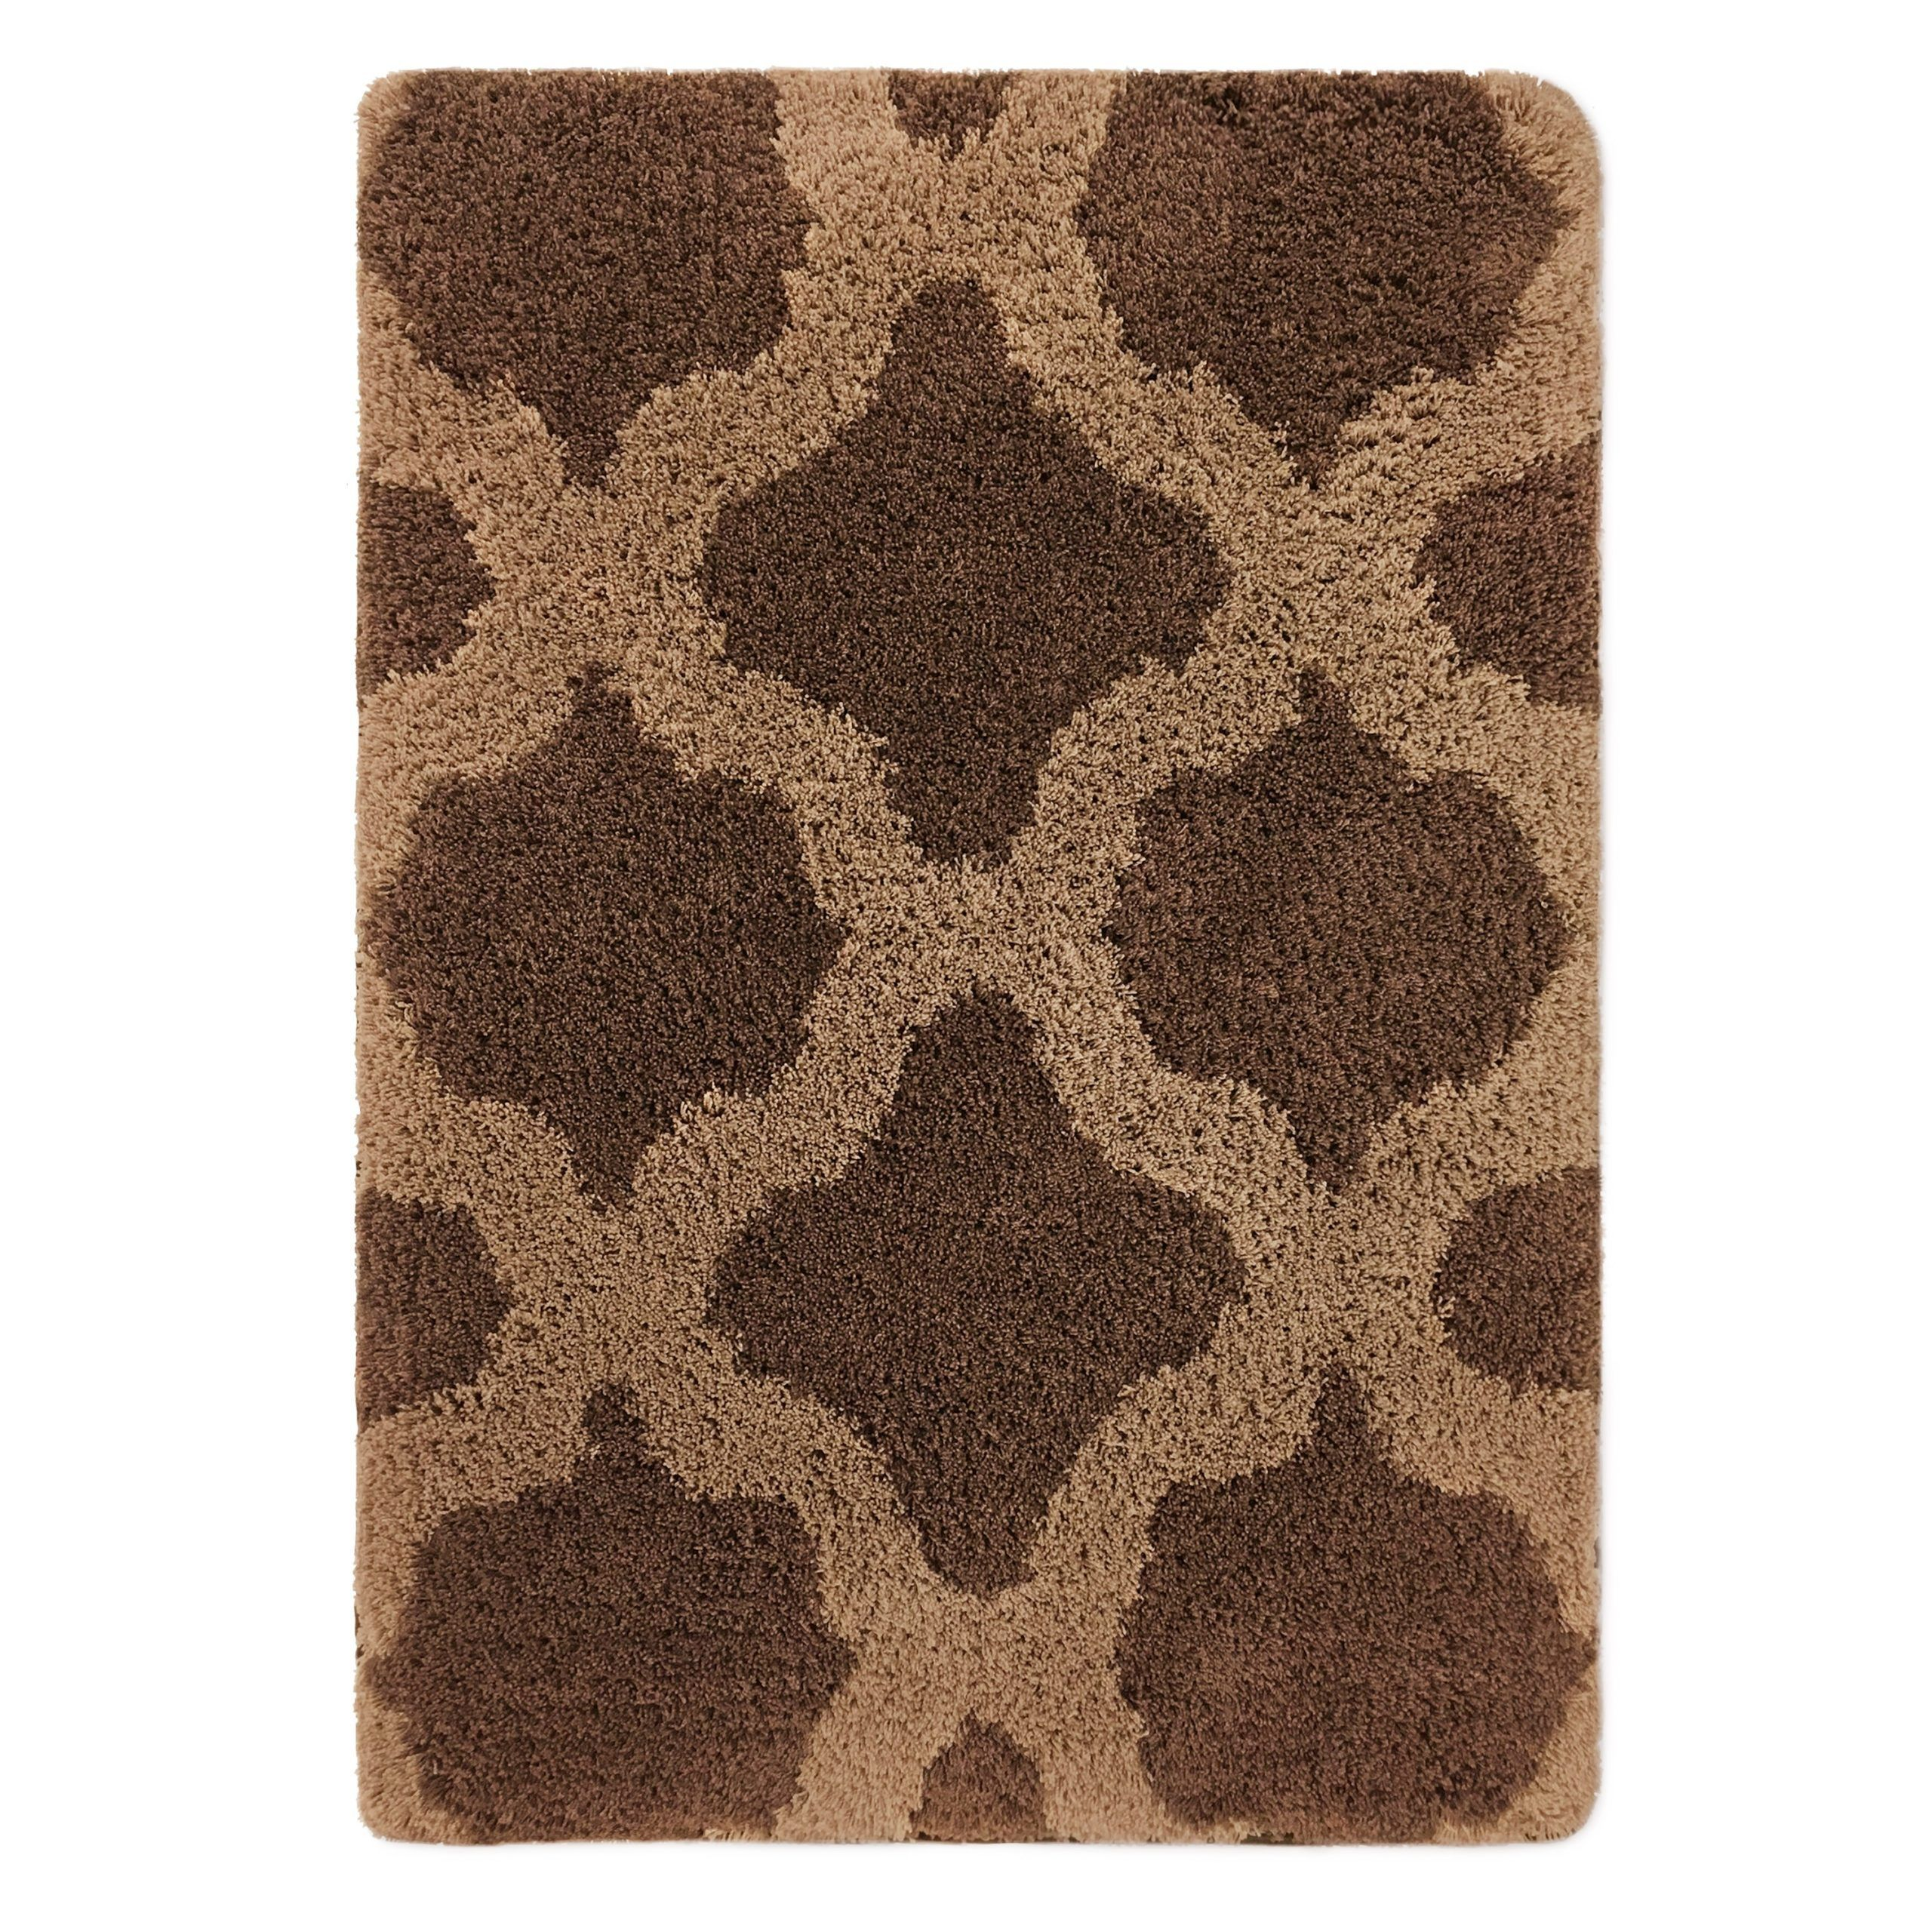 22+ Bathroom rugs walmart info